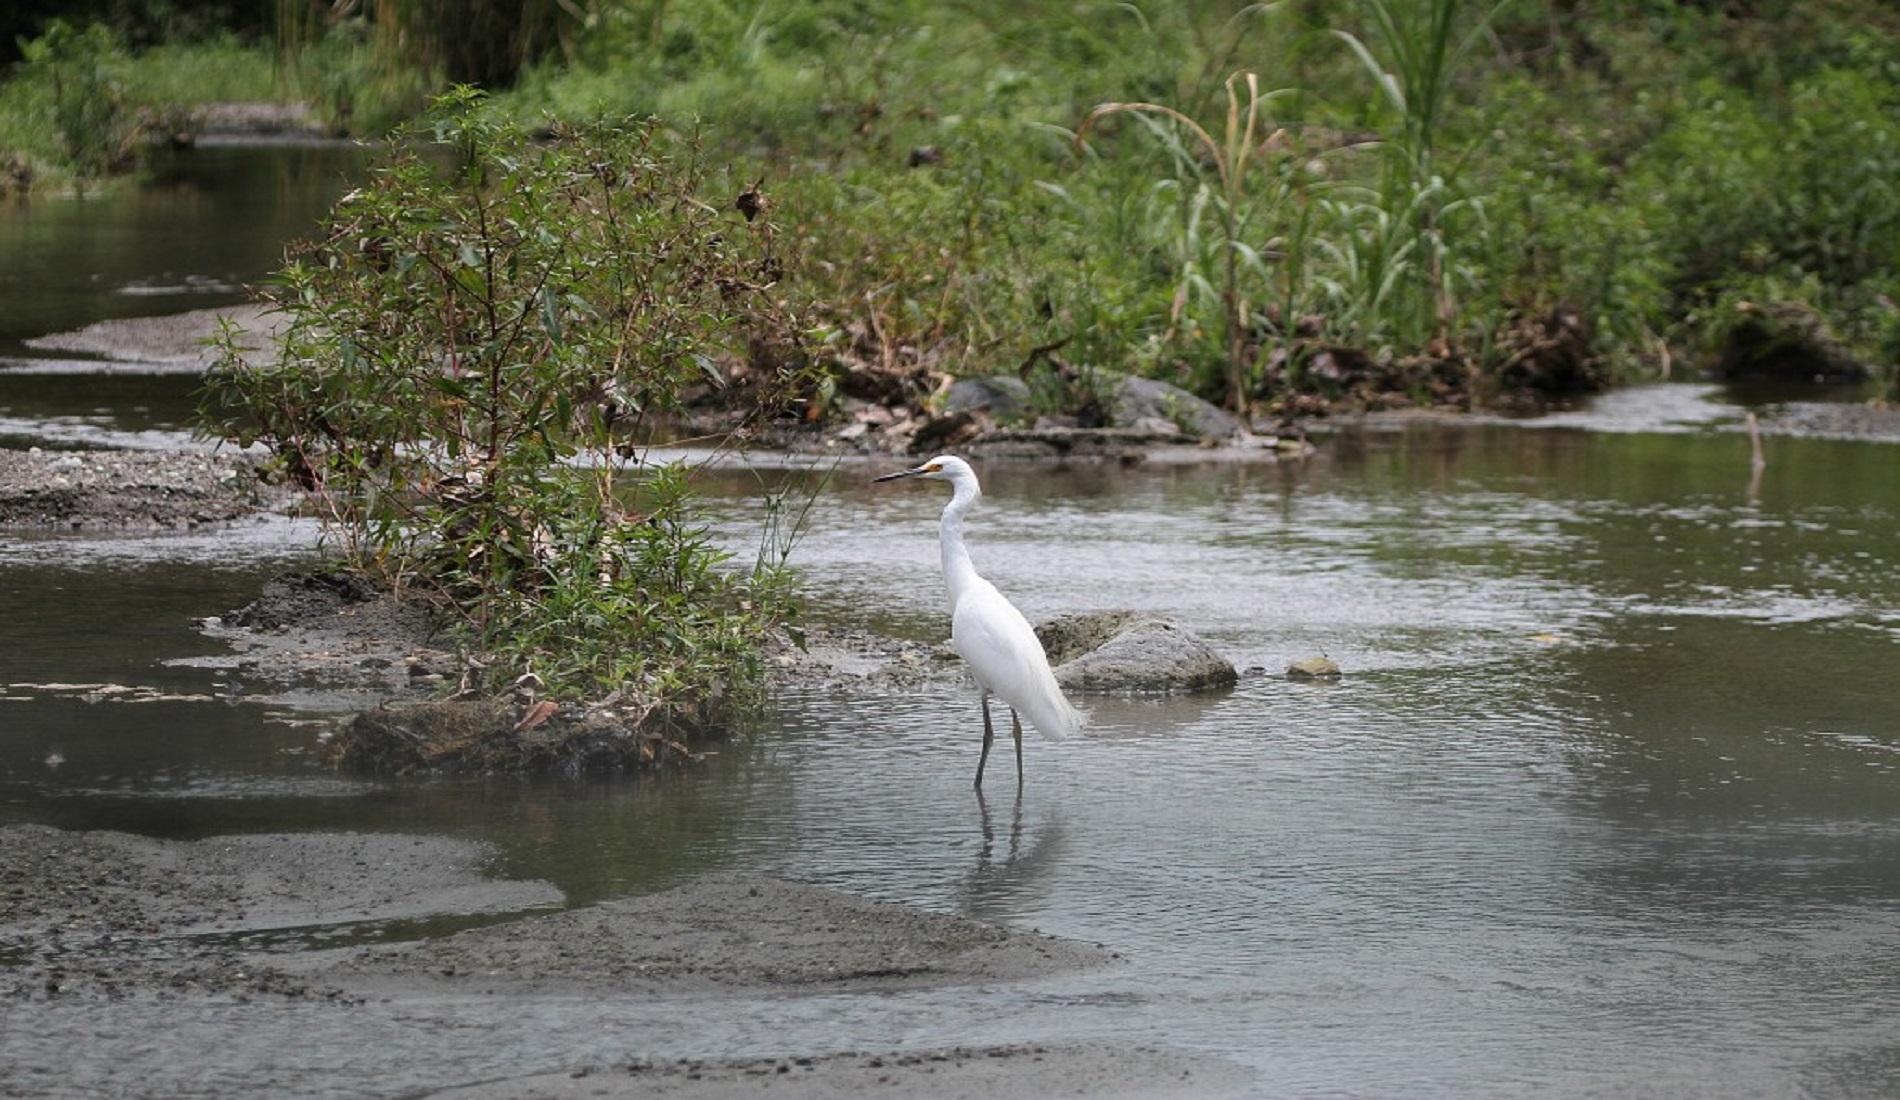 Snowy Egret Laguna del Hato vogelreis colombia